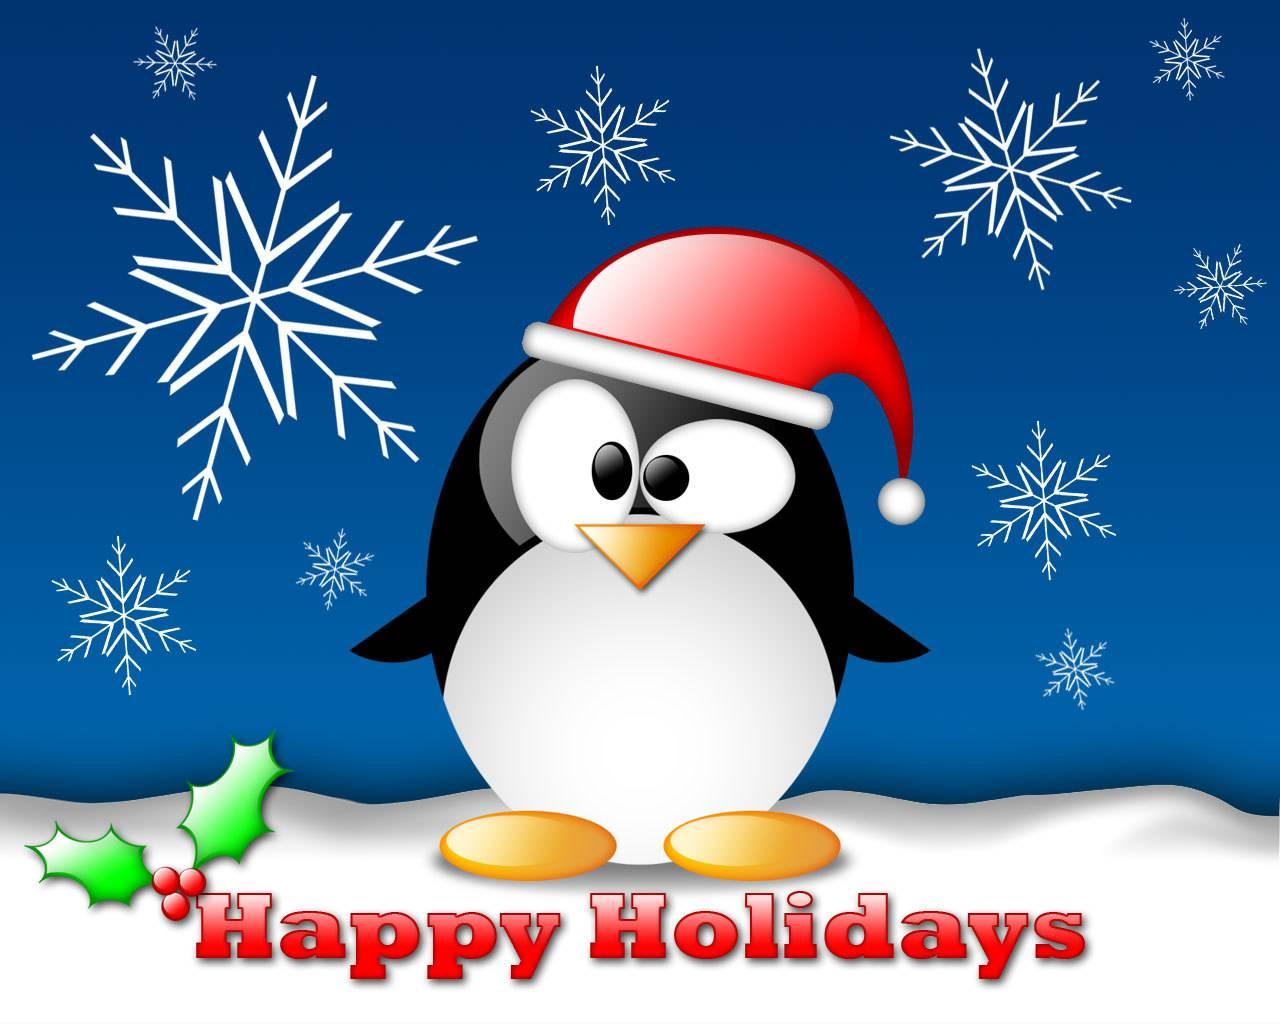 Winter Season With Happy Holiday